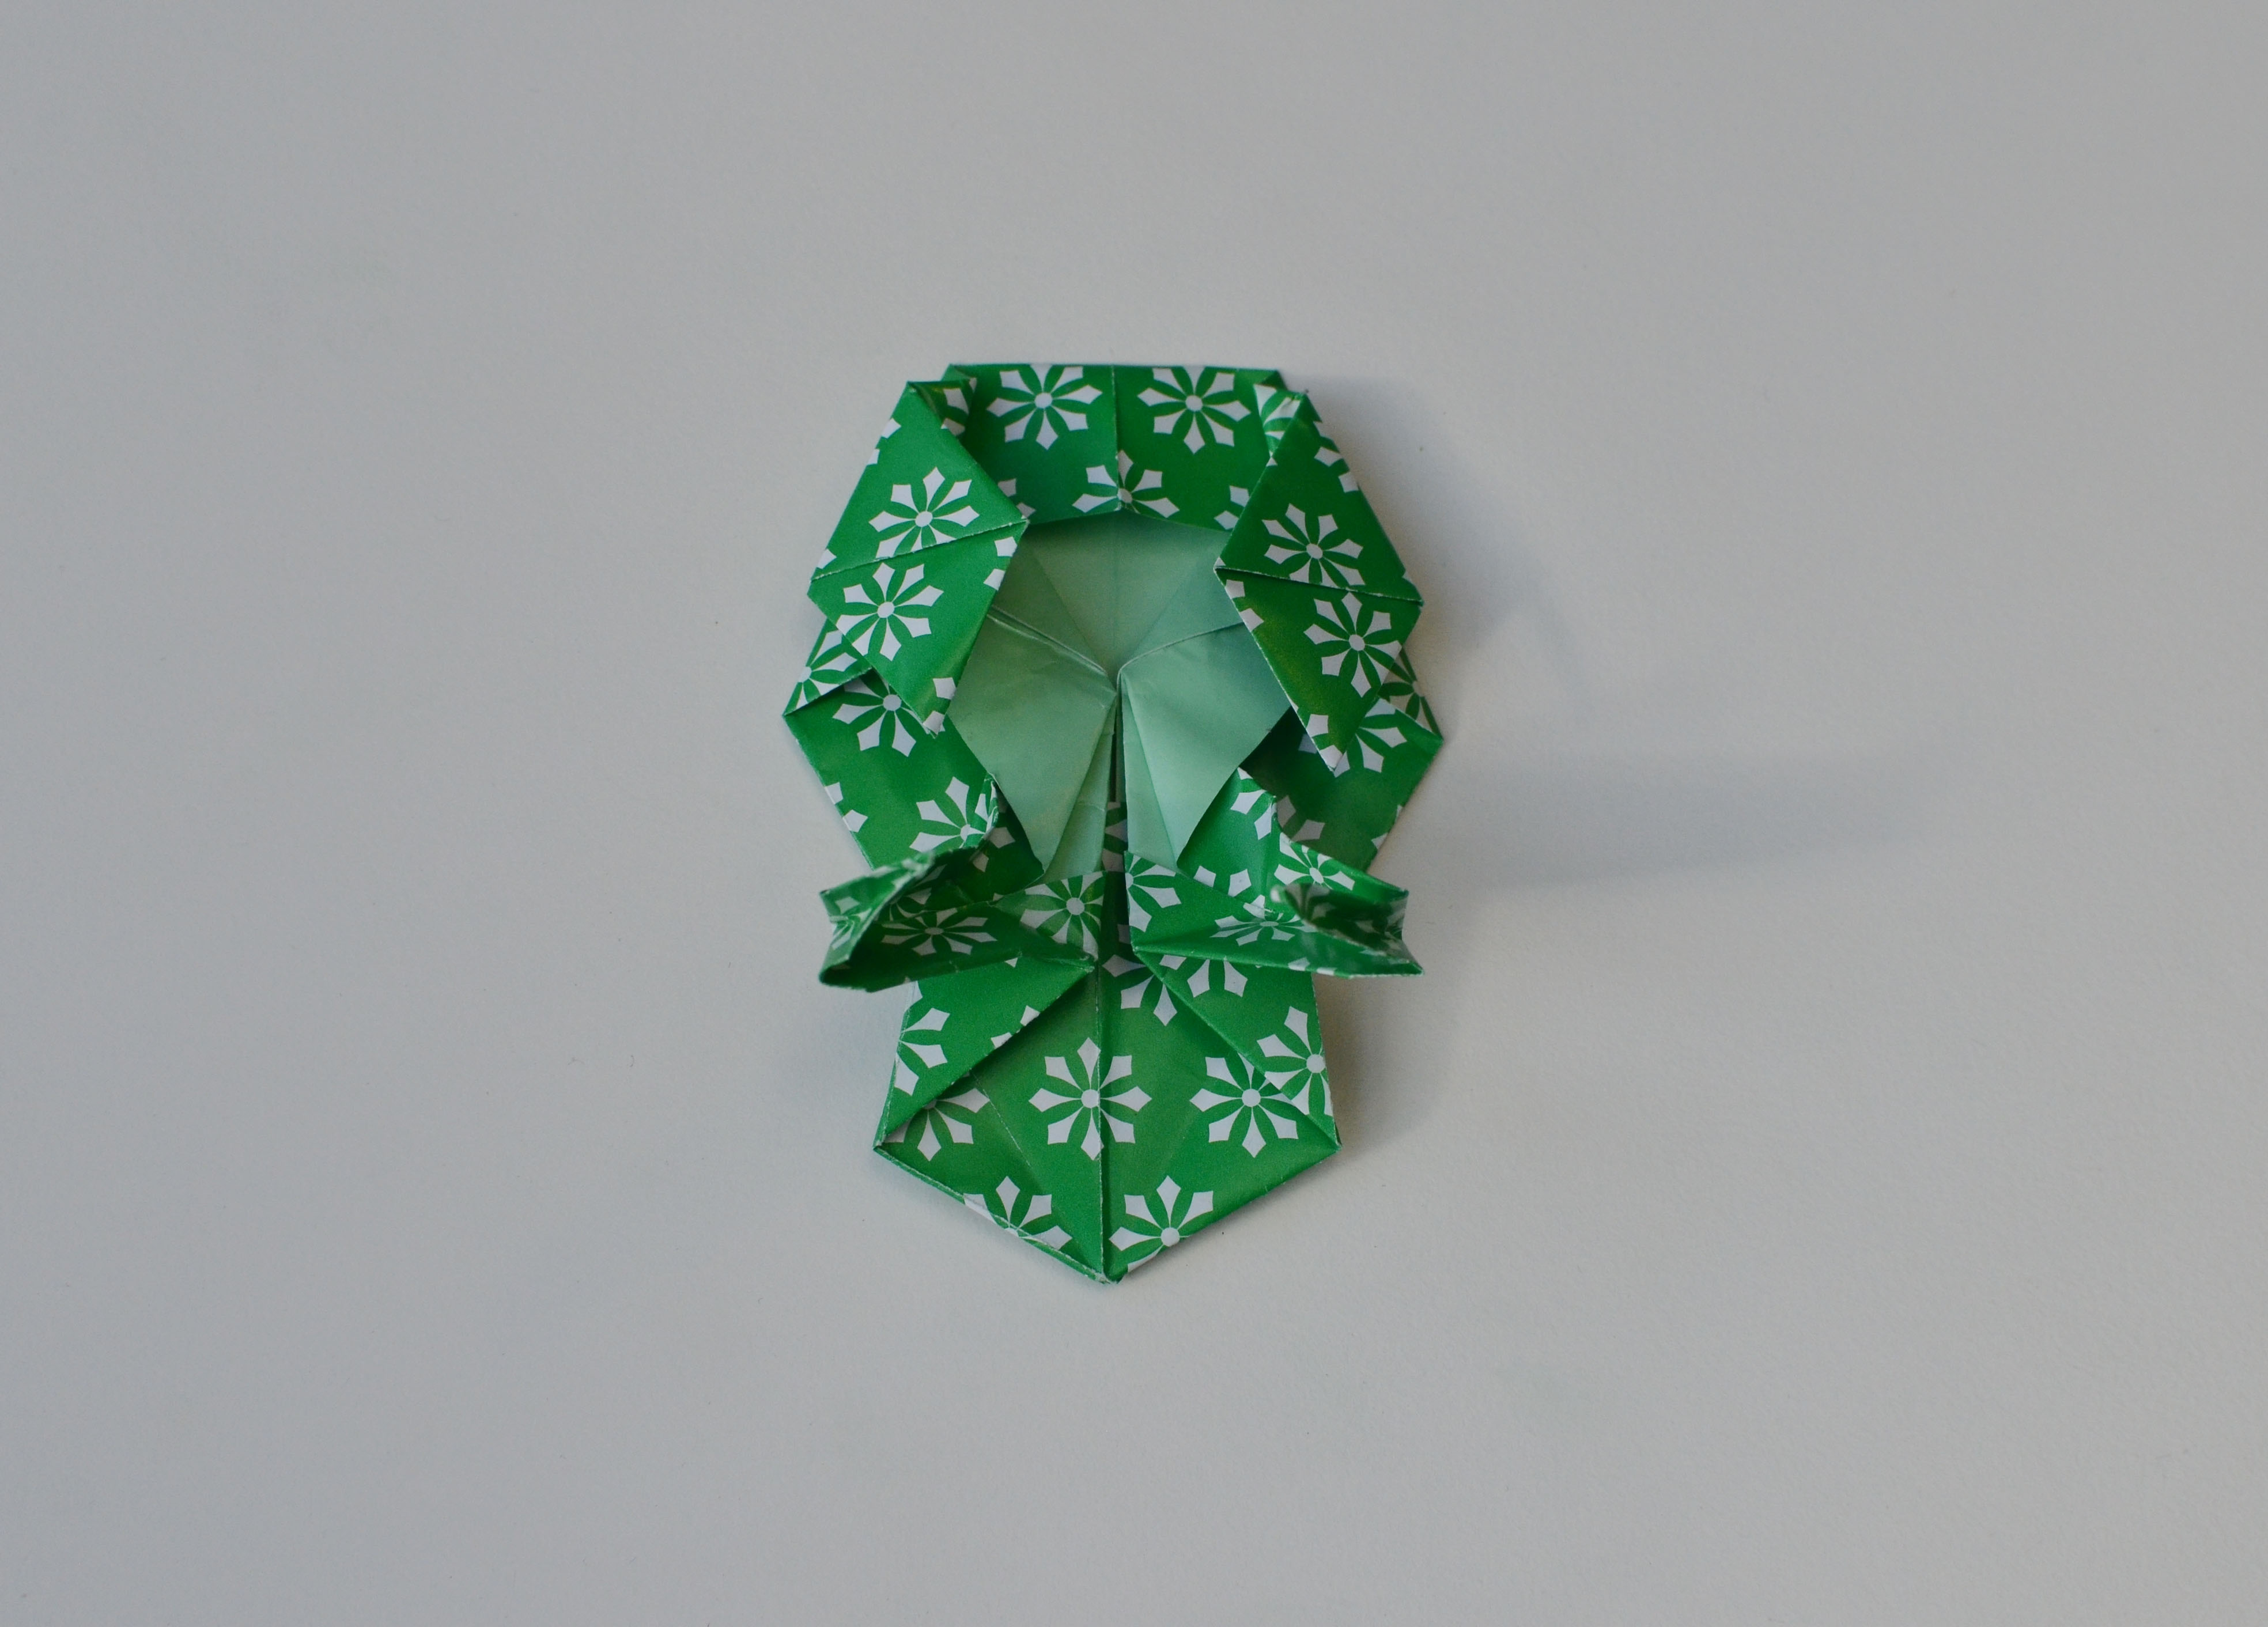 braincrafts_frog_origami_pt55.jpg